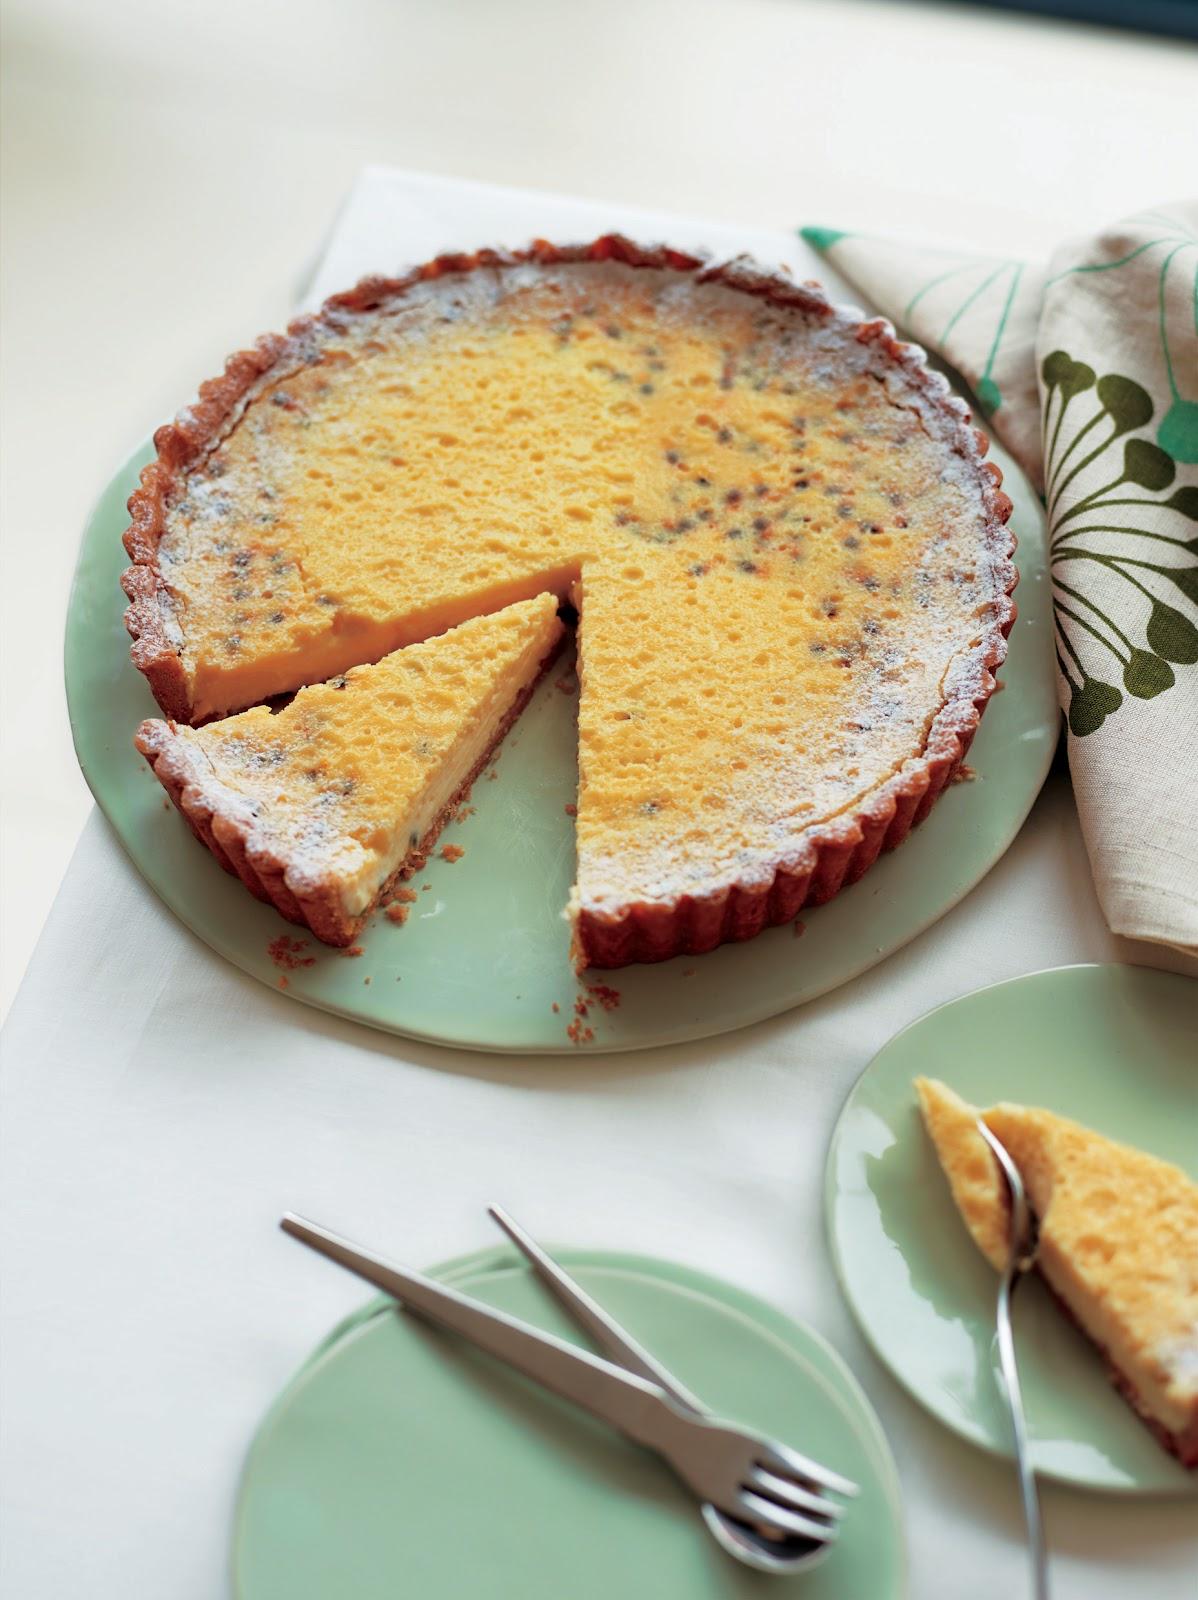 ... Fruit Tart and Gingerbread Souffles from Home Bake by Eric Lanlard